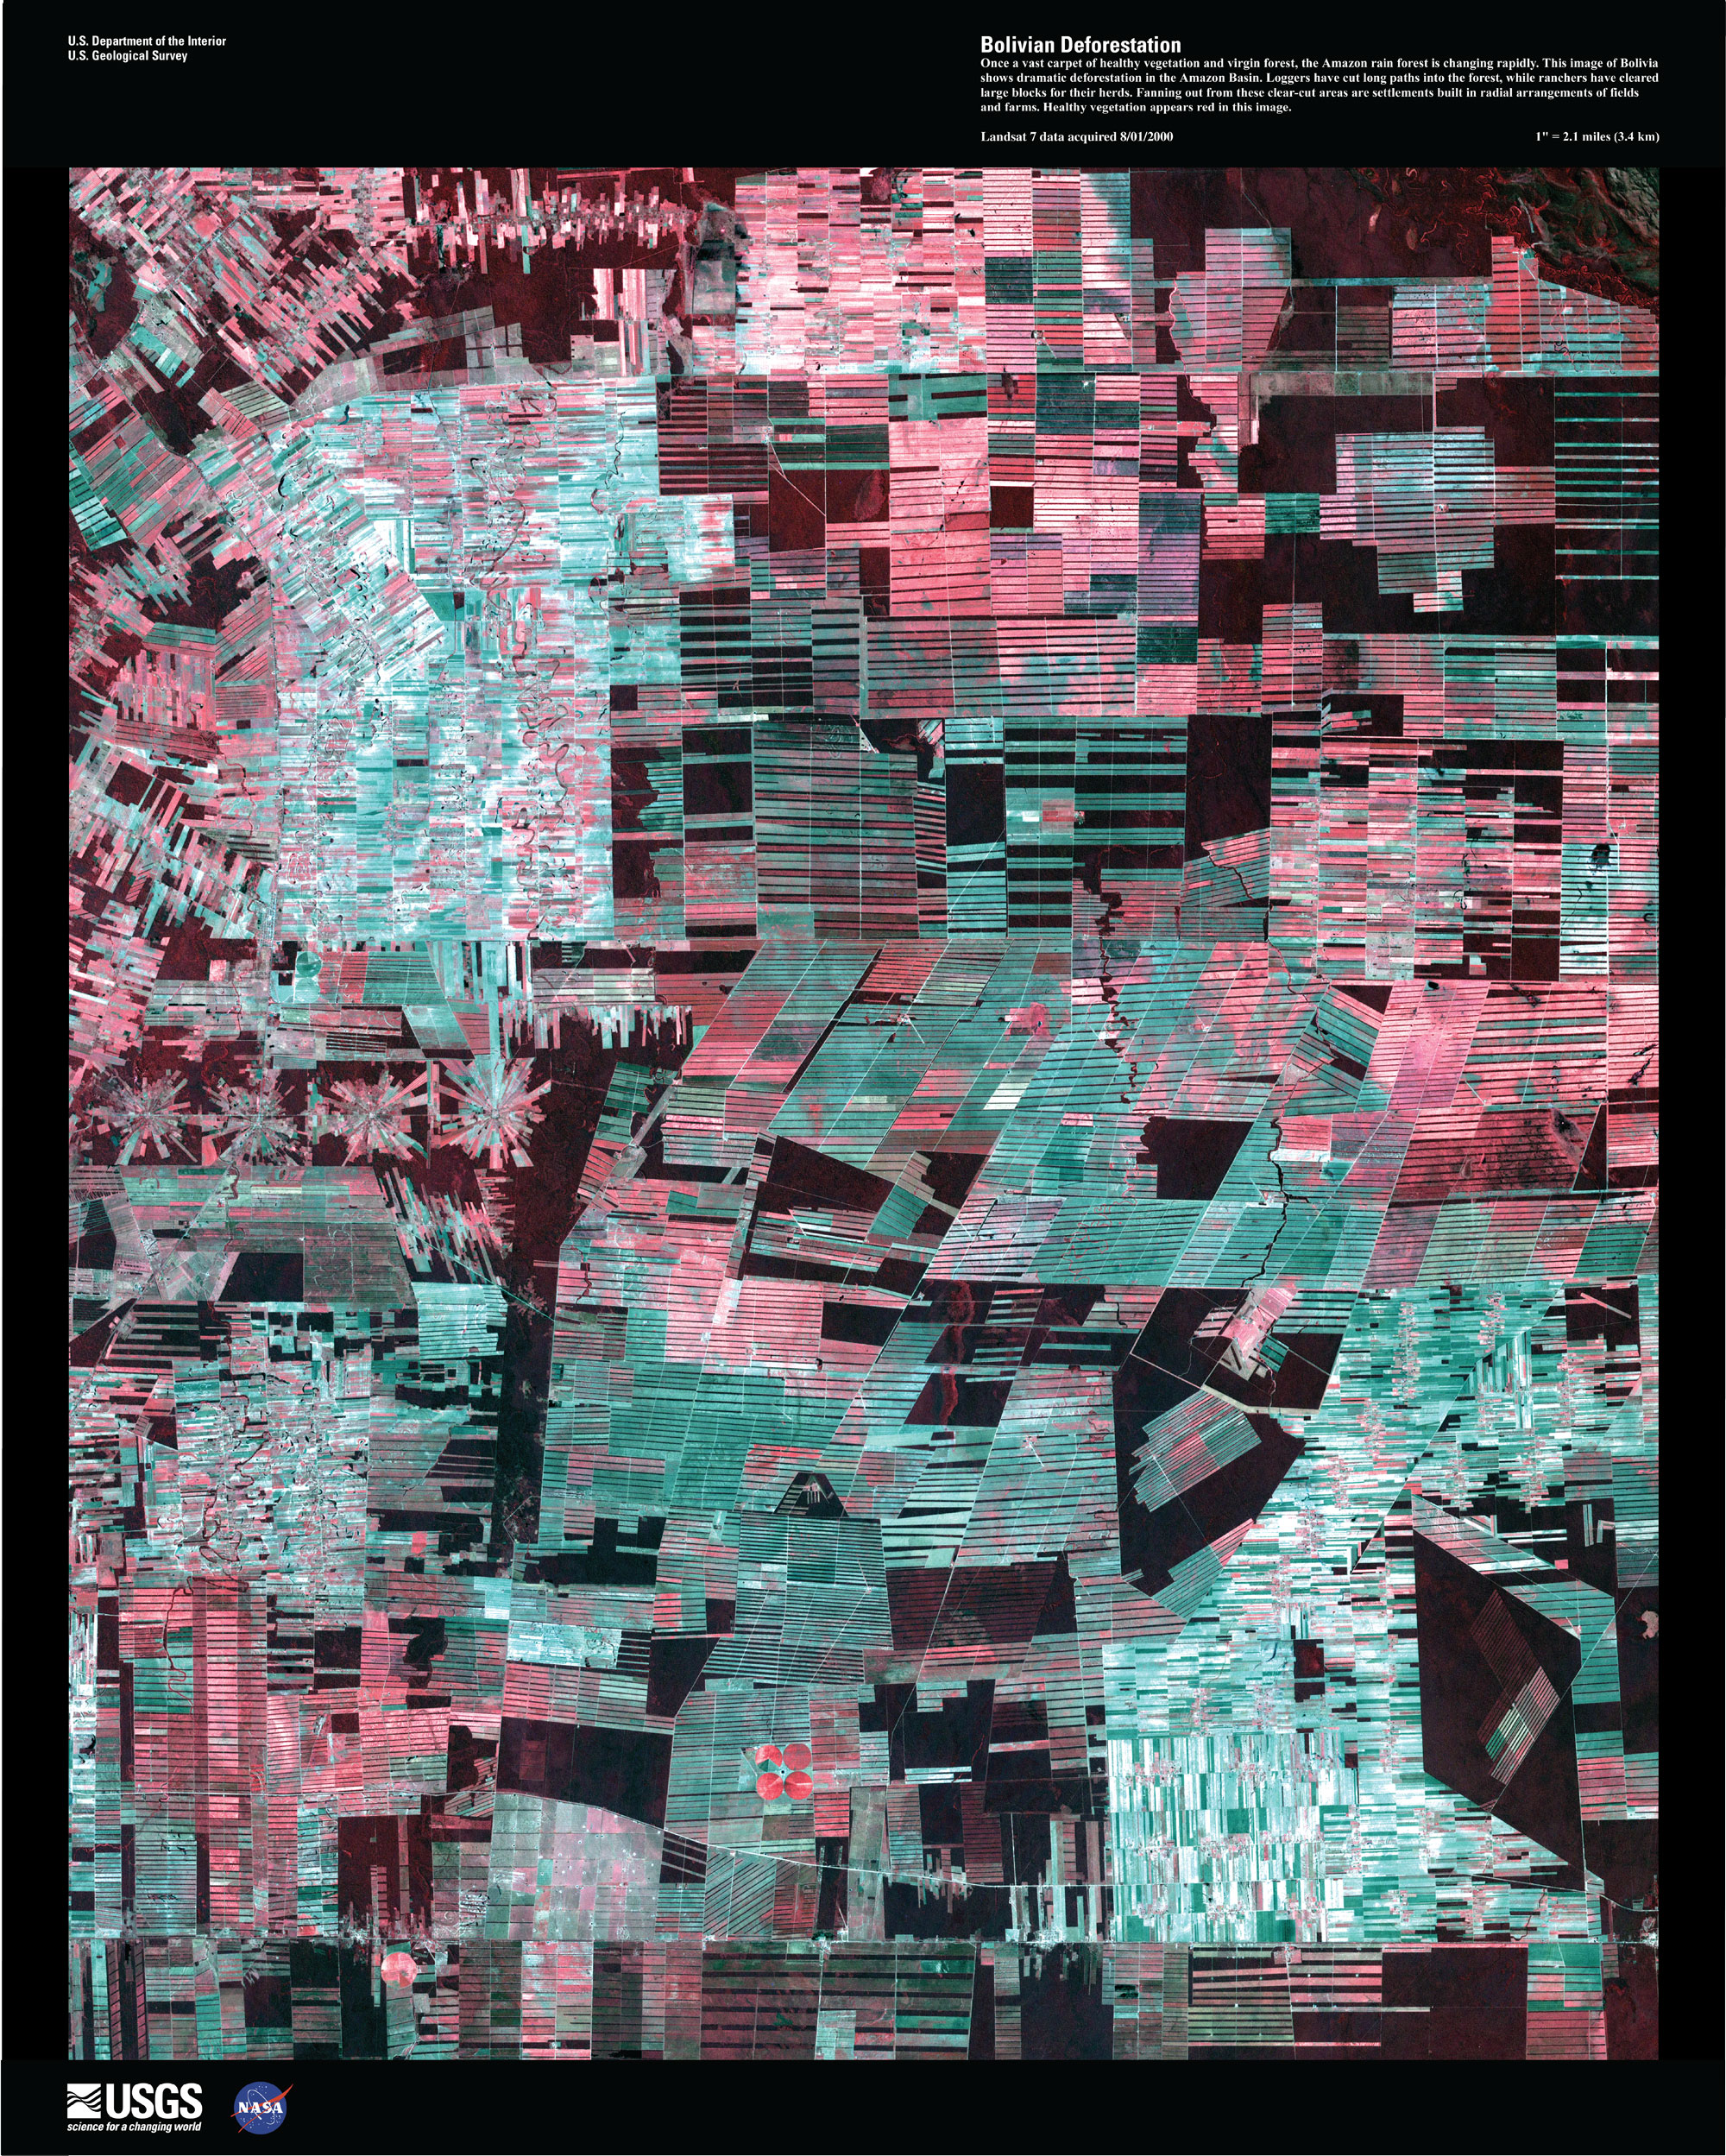 Satelite image of Bolivian Deforestation